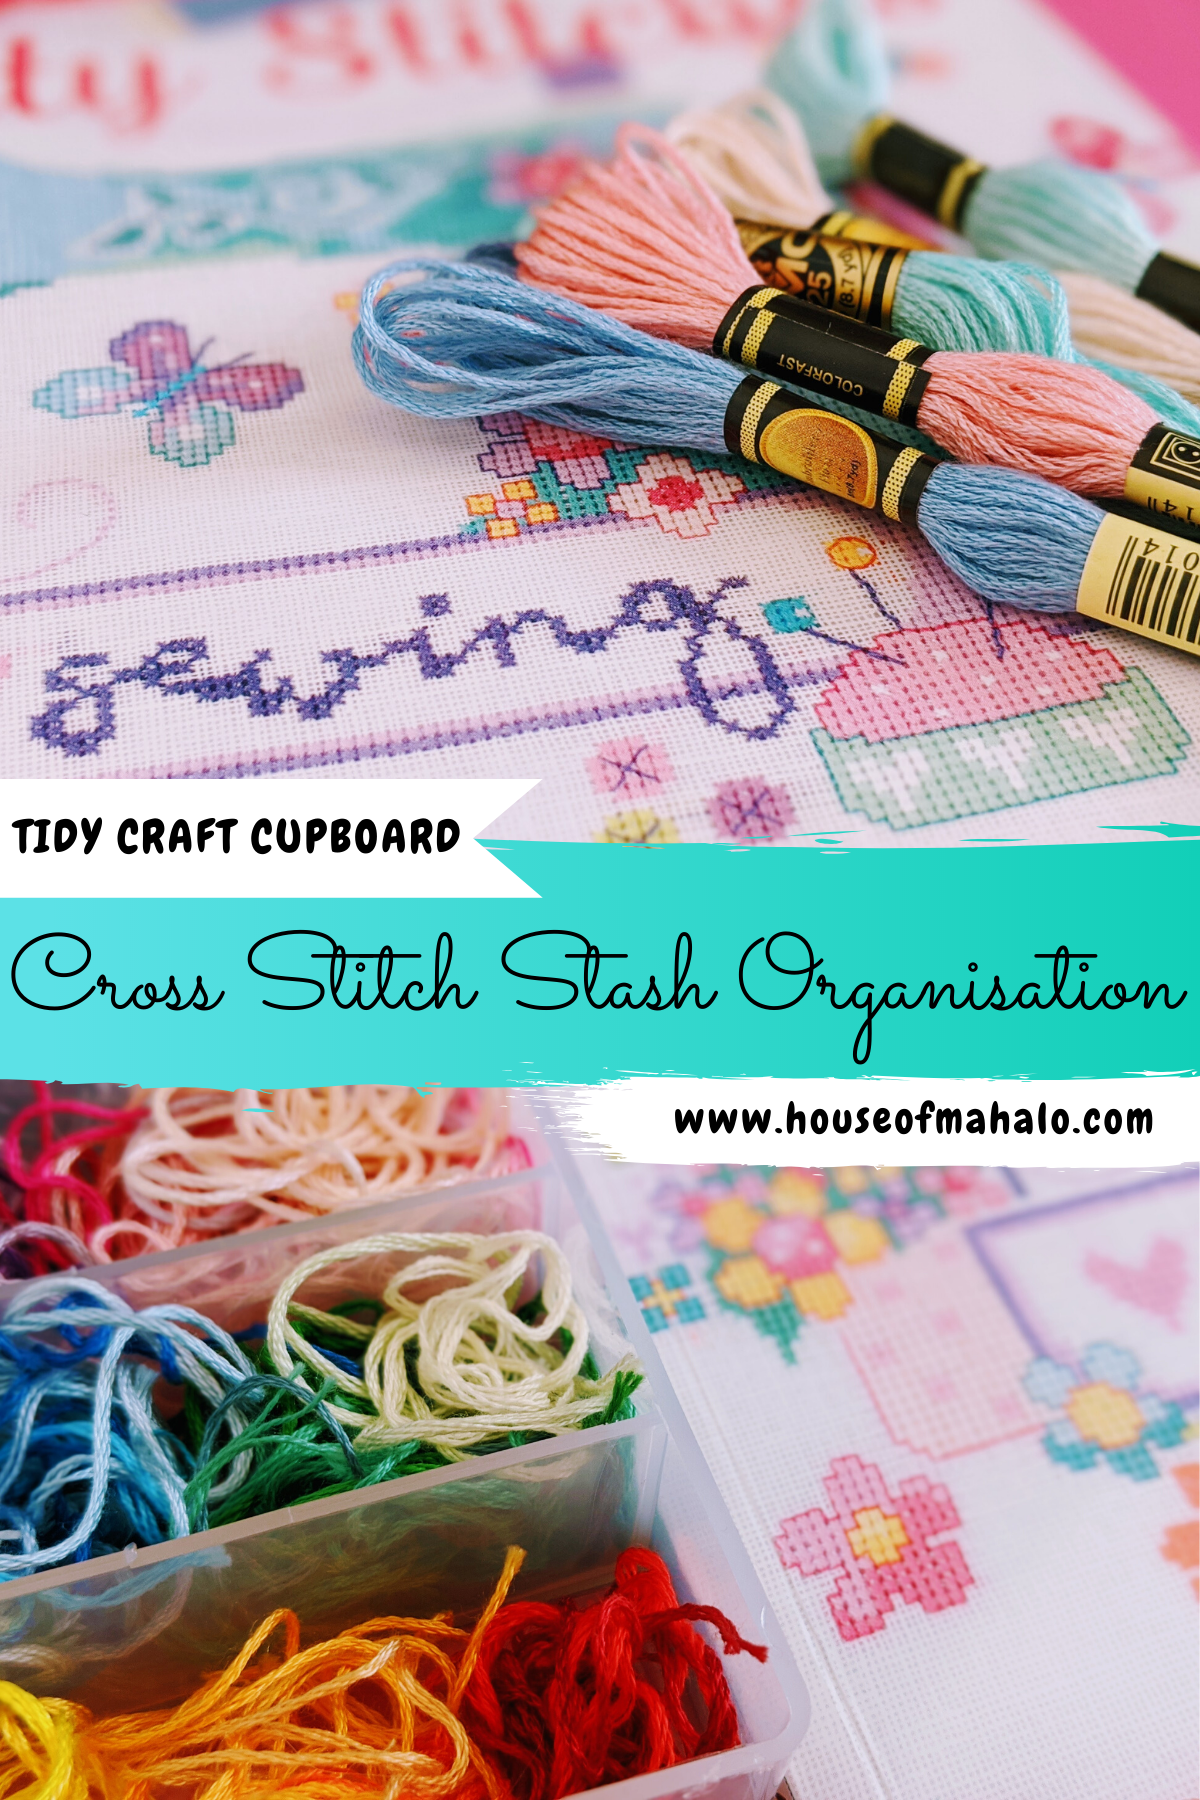 7 Easy Cross Stitch Stash Organisation Ideas